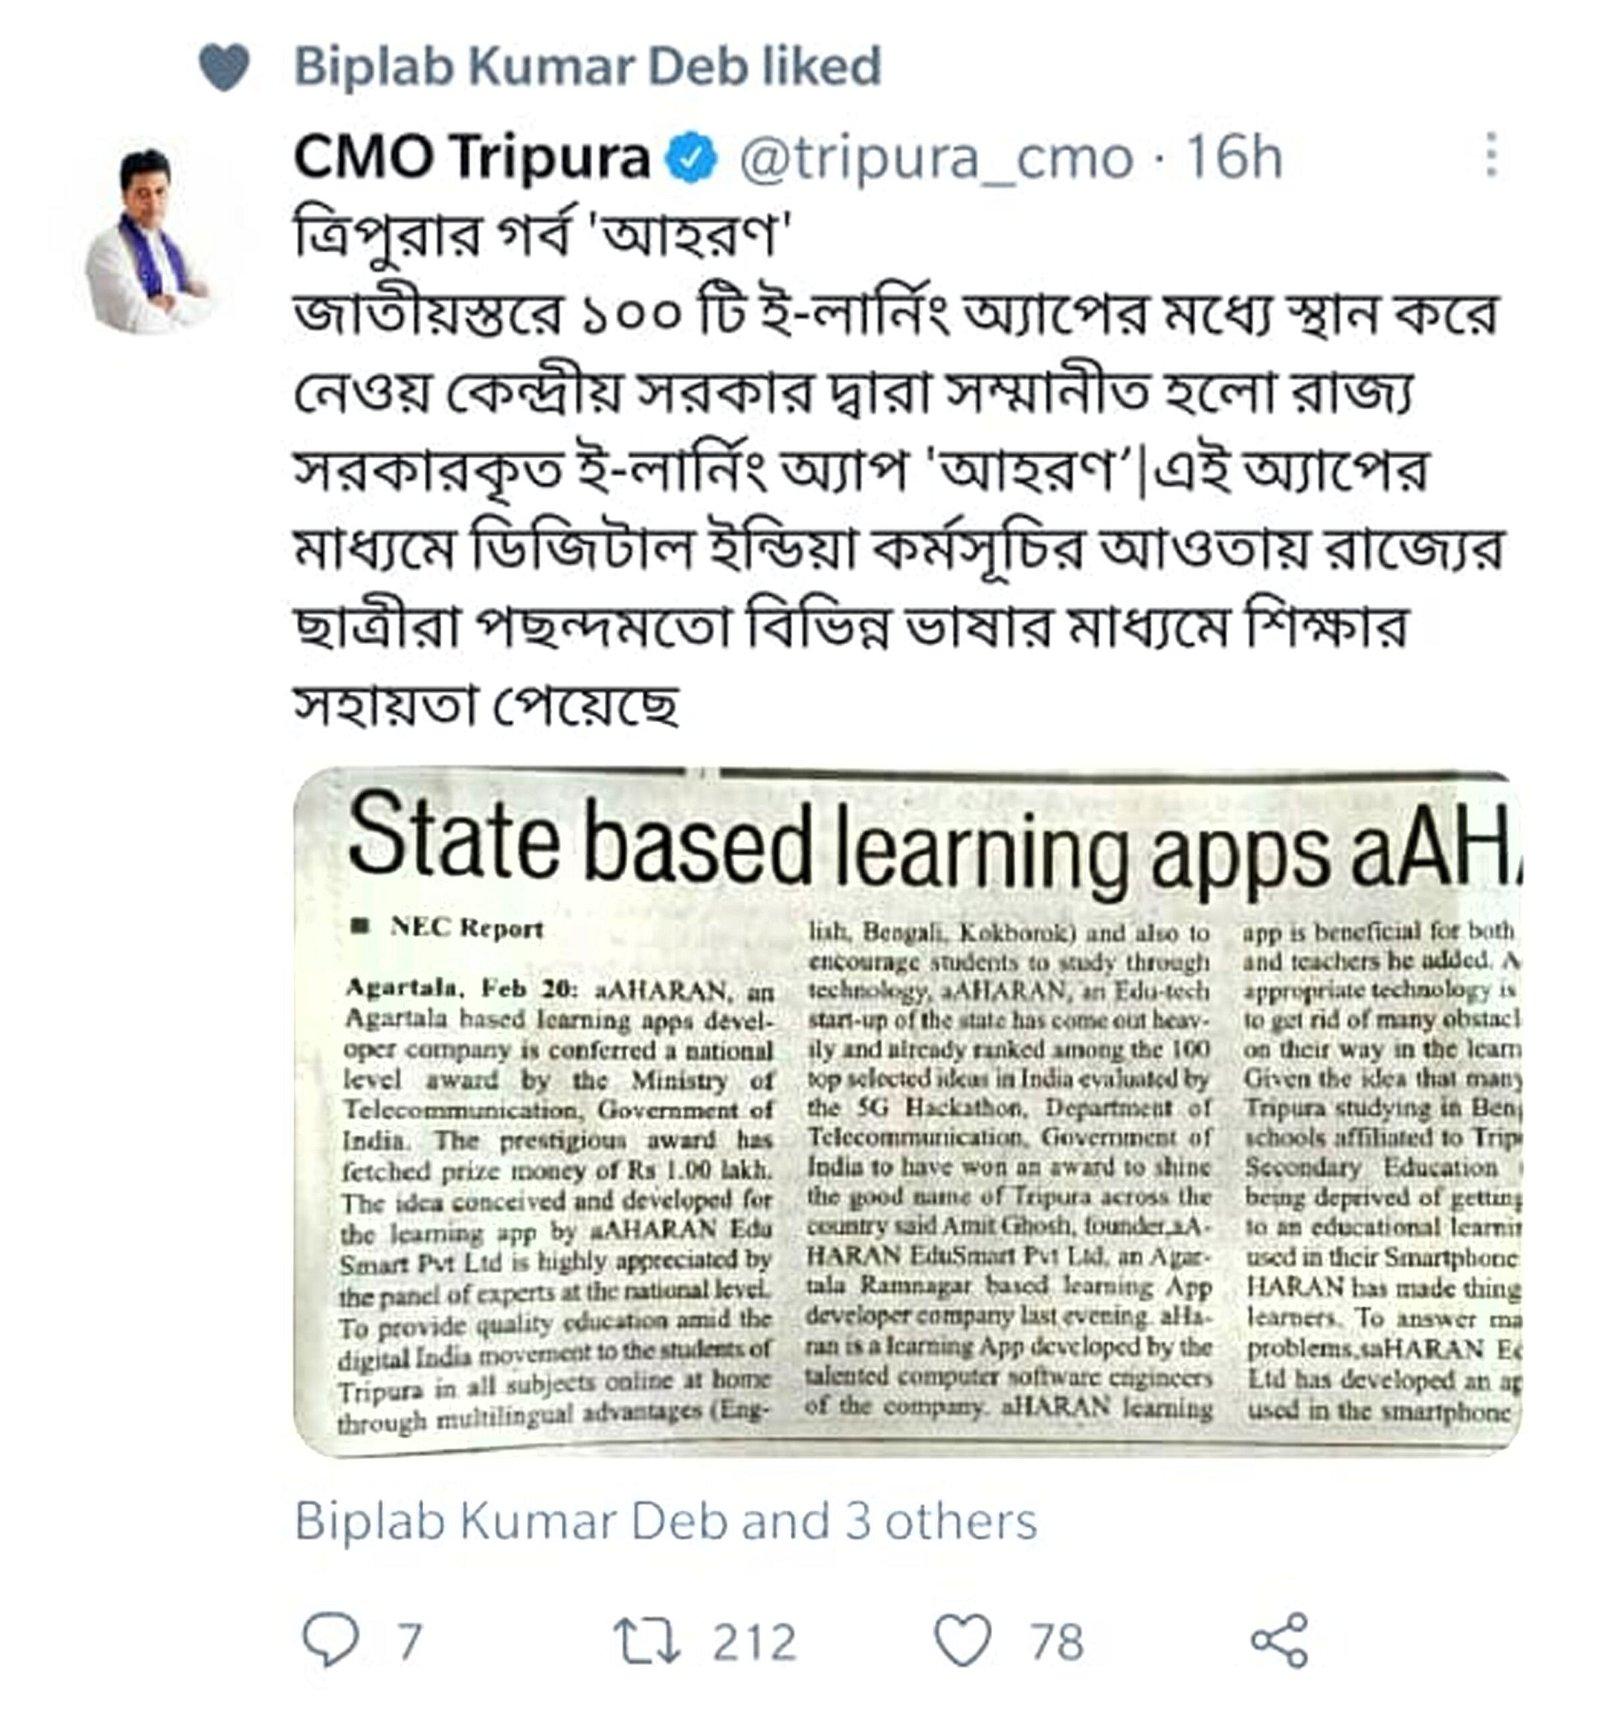 CMO Tripura tweet about aAHARAN award